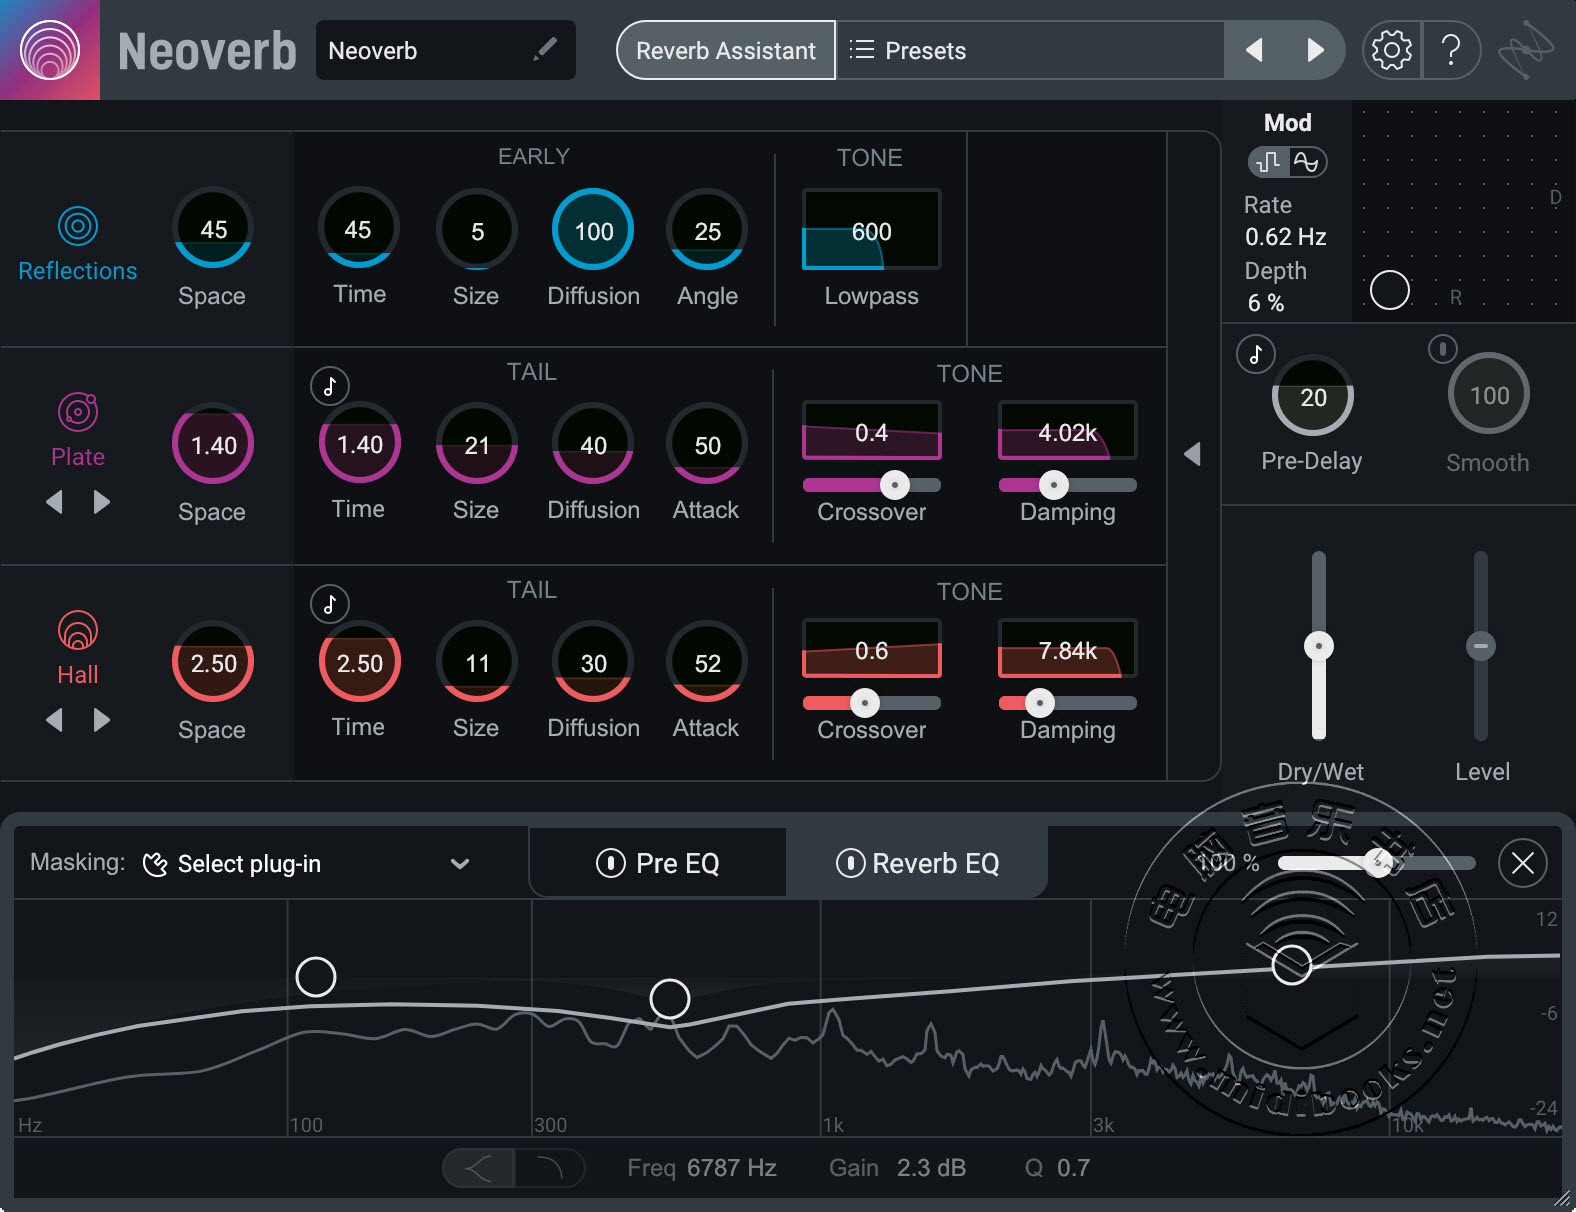 iZotope 推出最新智能混响 Neoverb(视频)